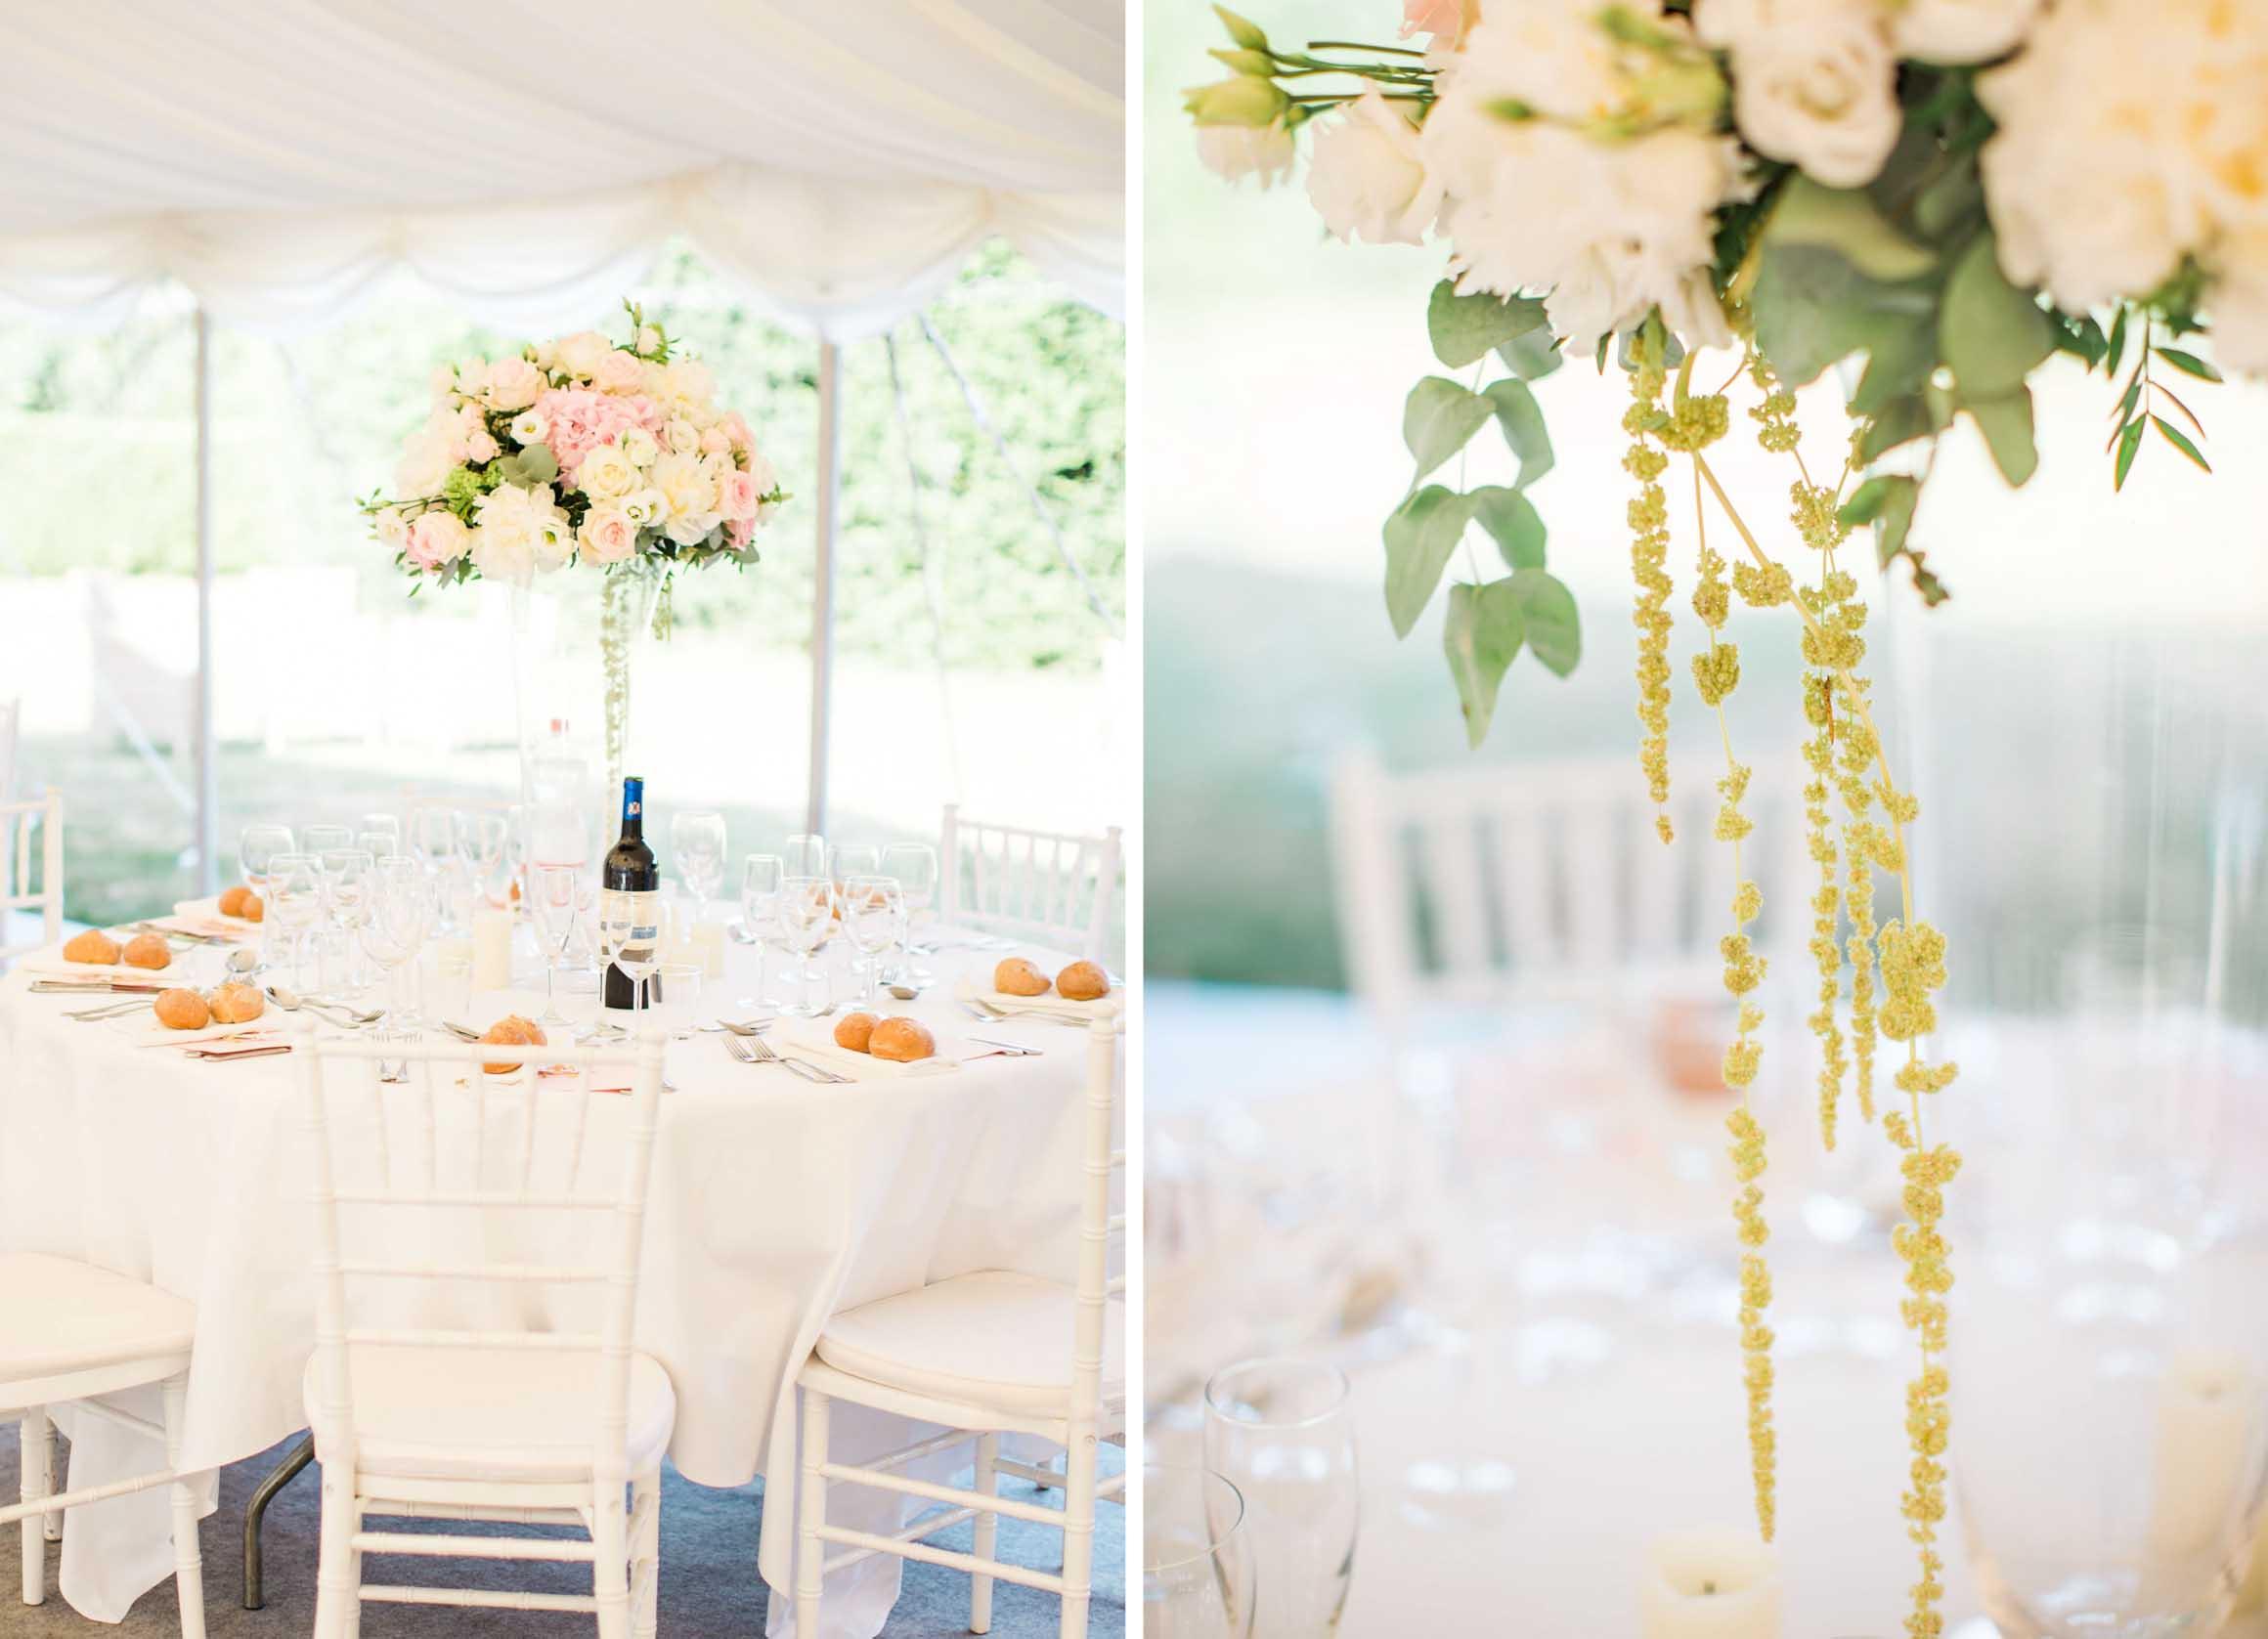 Amy O'Boyle Photography- Destination & UK Fine Art Film Wedding Photographer- Chateau La Durantie Wedding 6.jpg